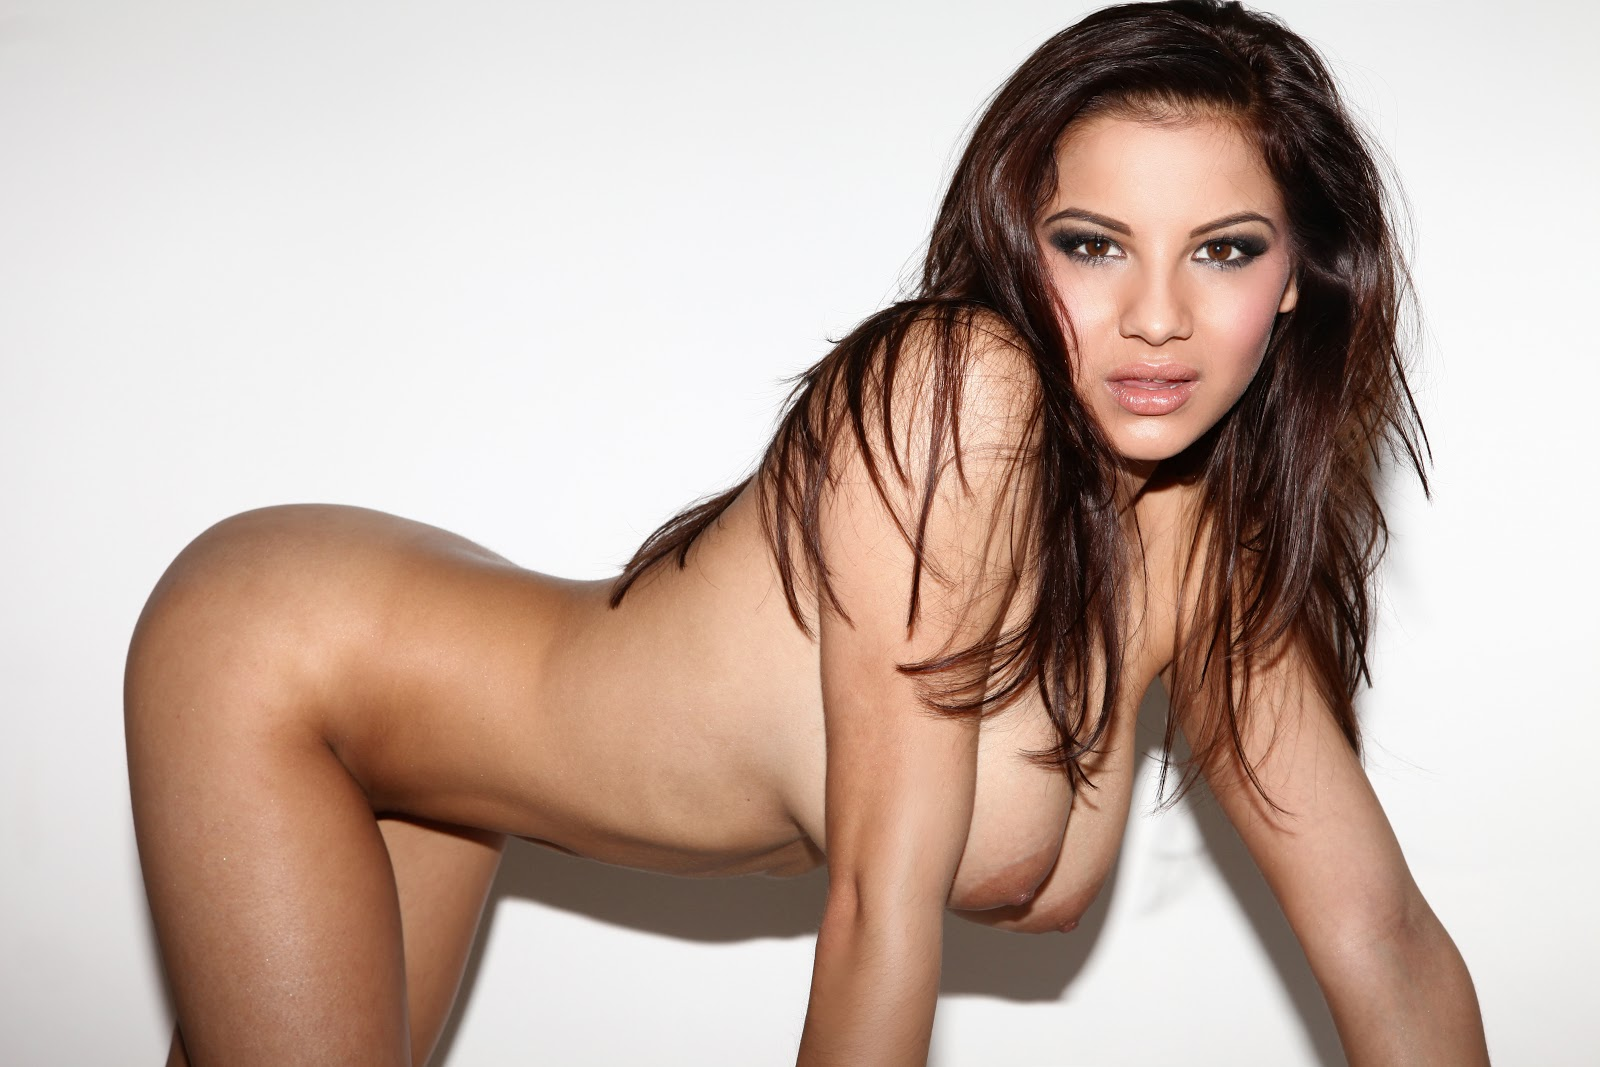 Lacey Banghard - English Glamour Model Naked Photos (52 pics) 39